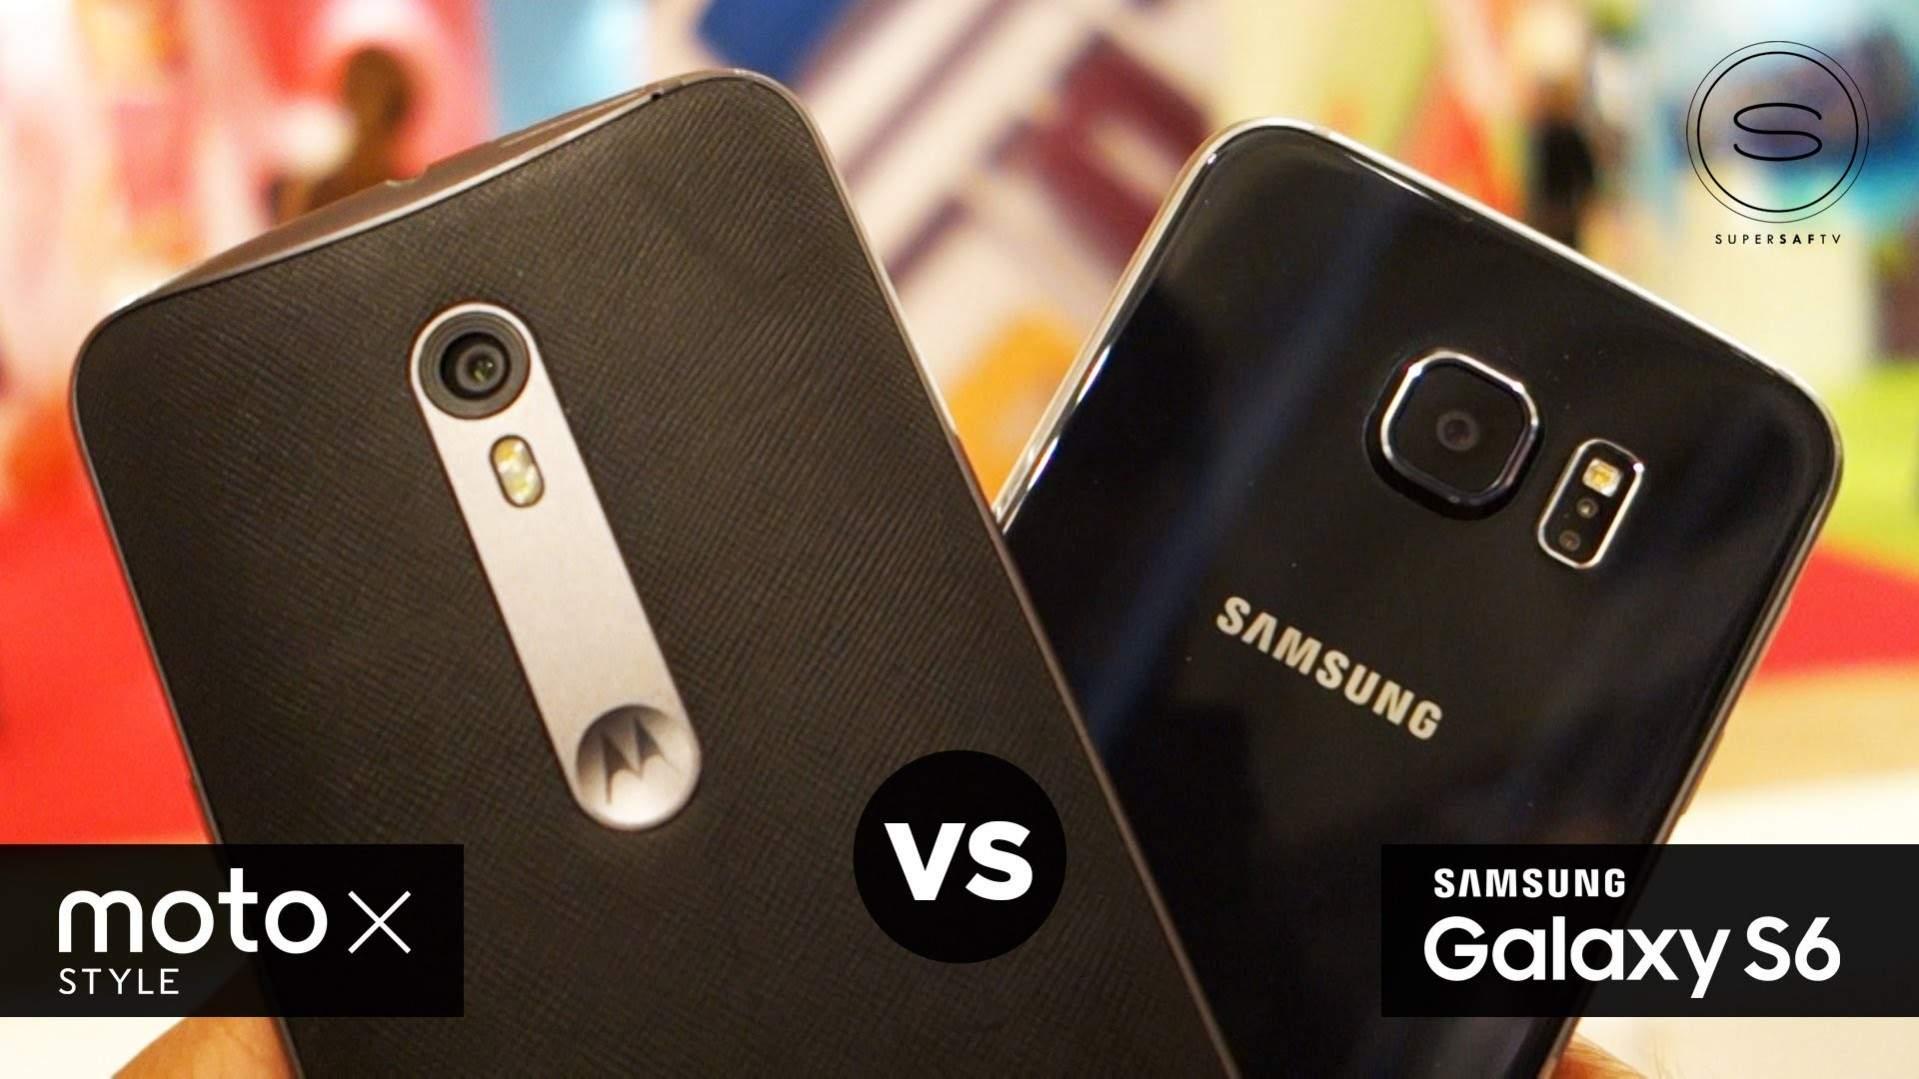 Motorola Moto X Style Vs Samsung Galaxy S6 Duel Ponsel